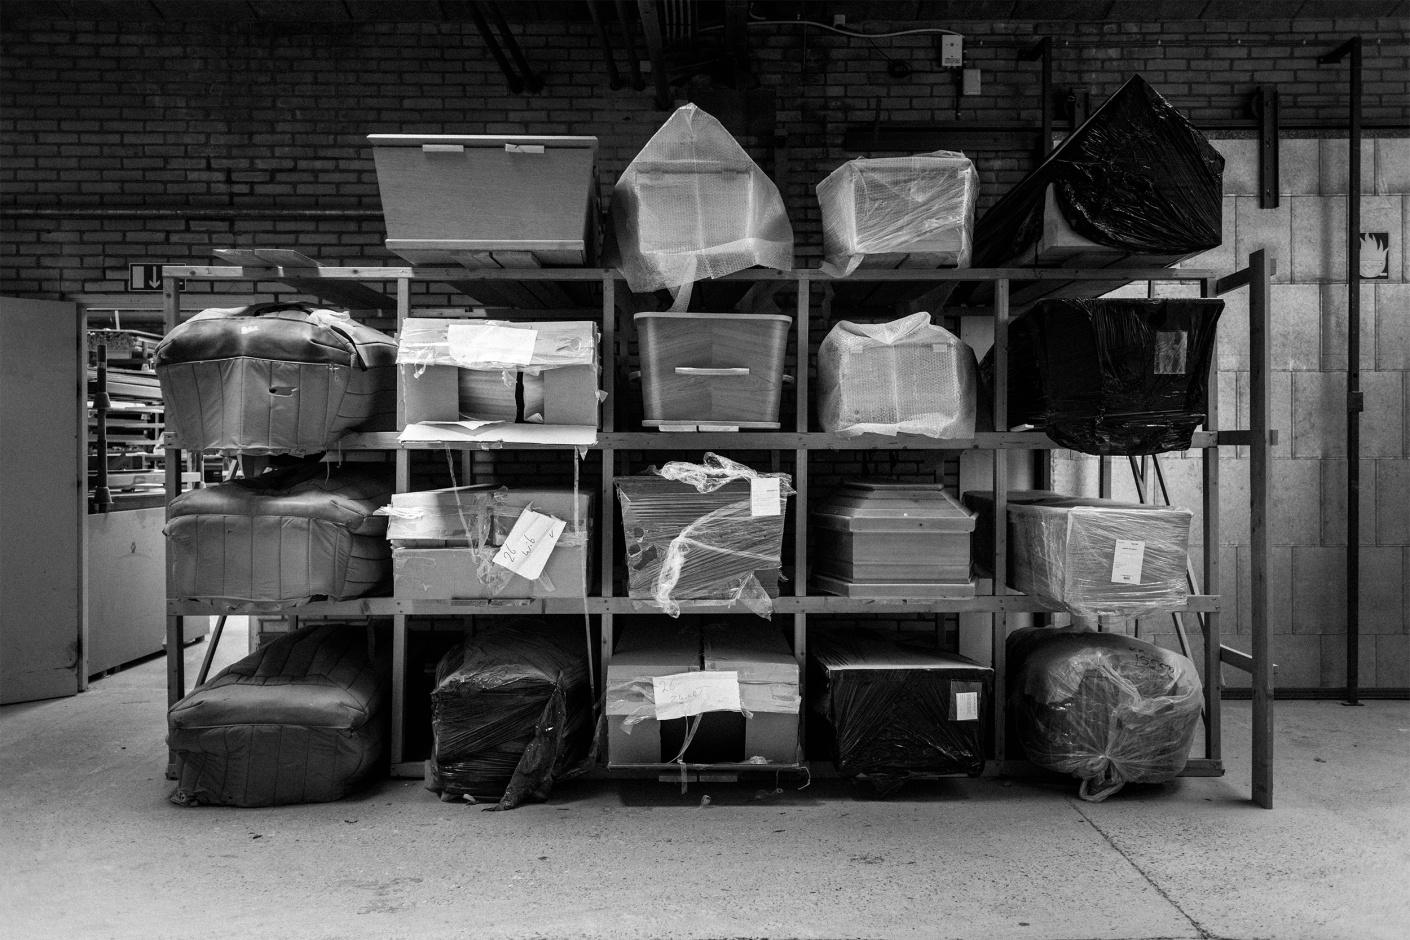 1 | De Kistenfabriek | CORONA | Jelle Pieter de Boer | 2020